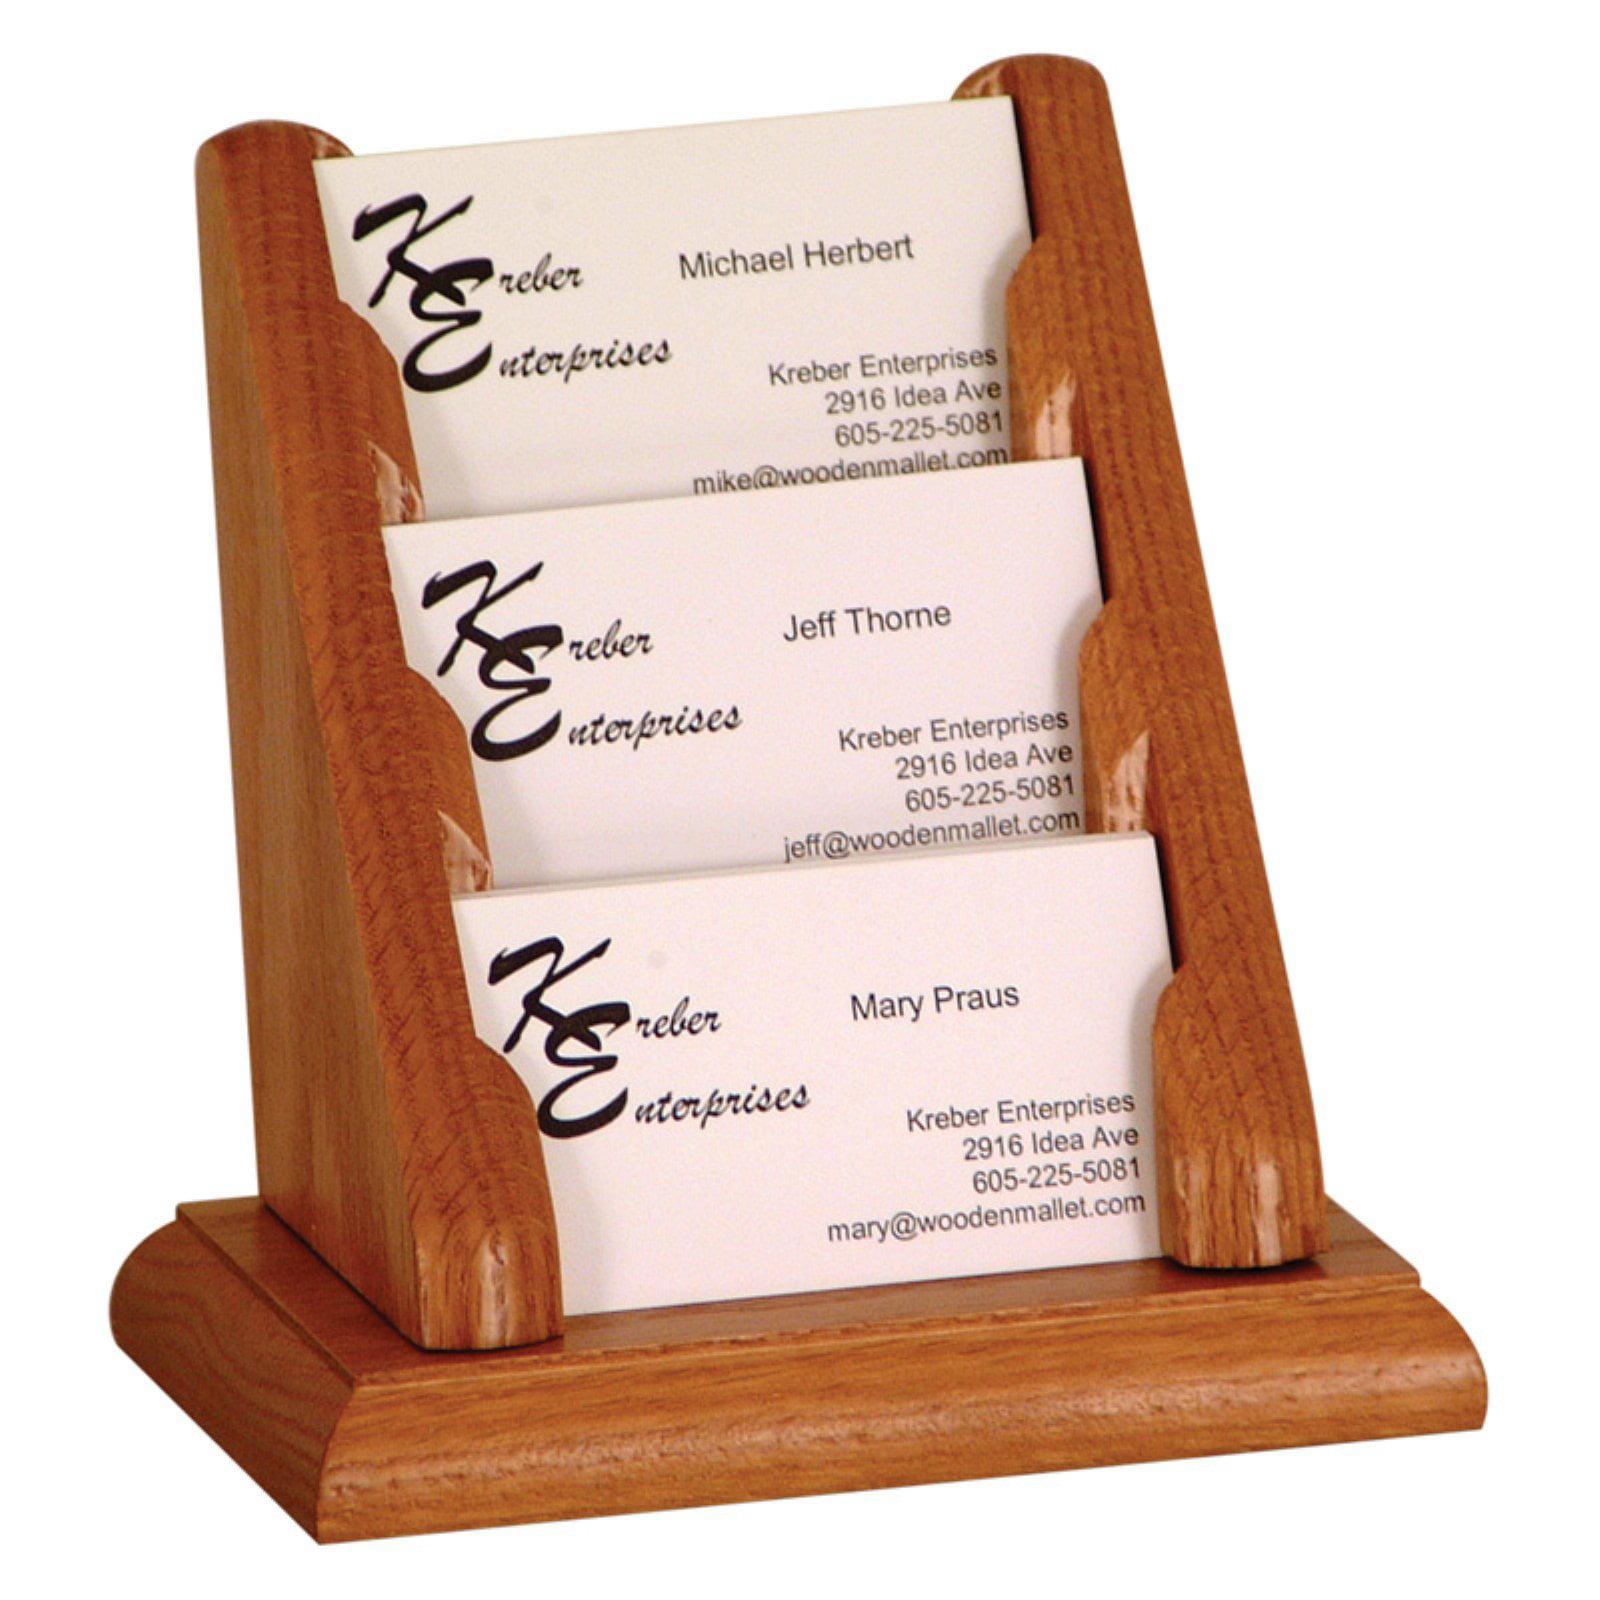 Wooden Mallet 3-Pocket Counter Top Business Card Holder